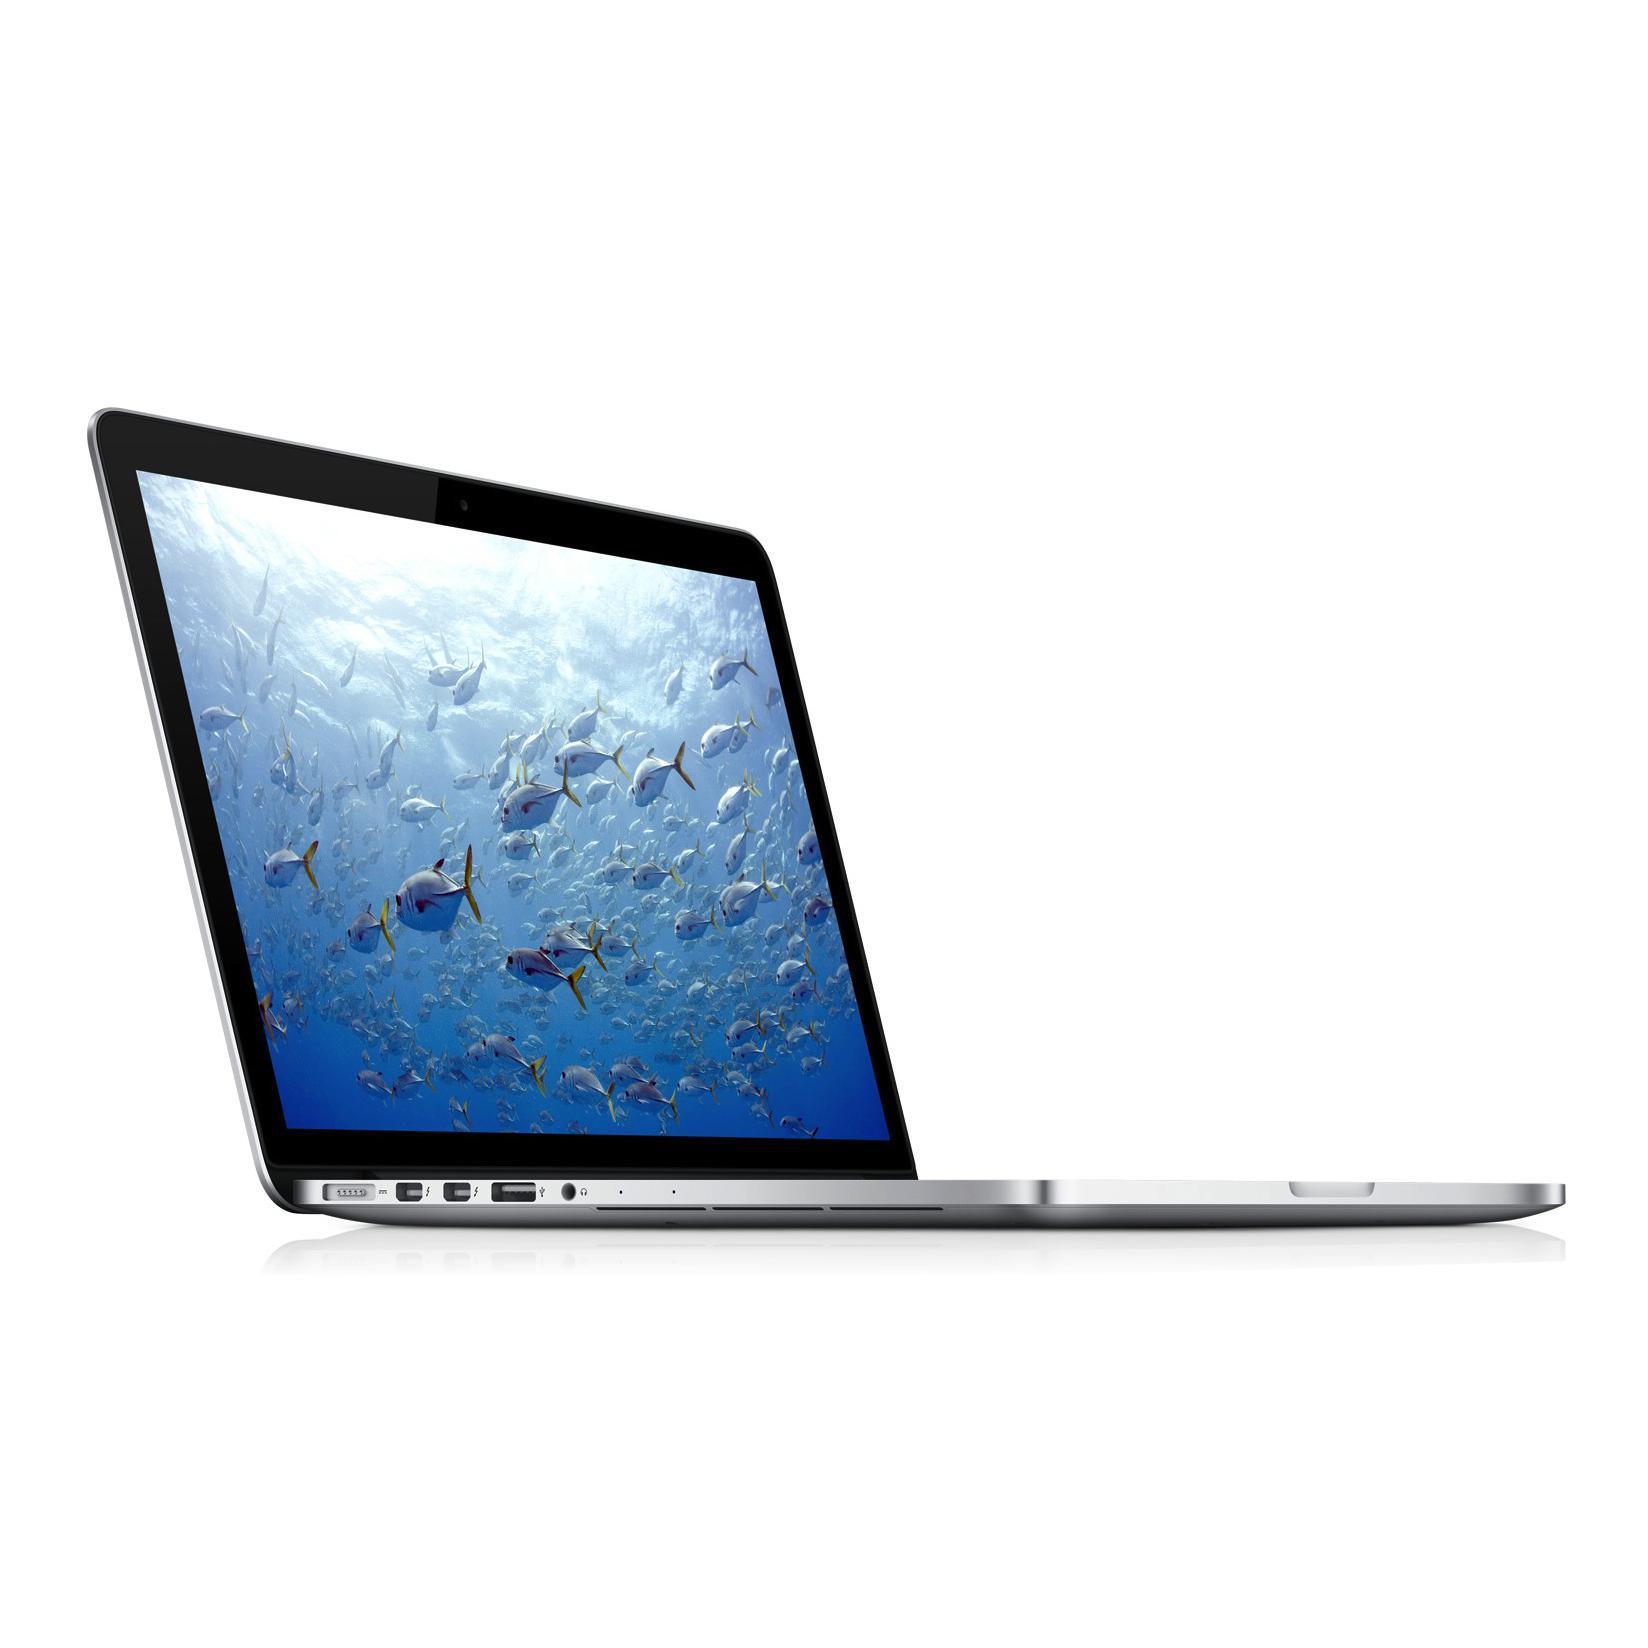 MacBook Pro Retina 13.3-inch (2013) - Core i7 - 8GB - SSD 512 GB AZERTY - French